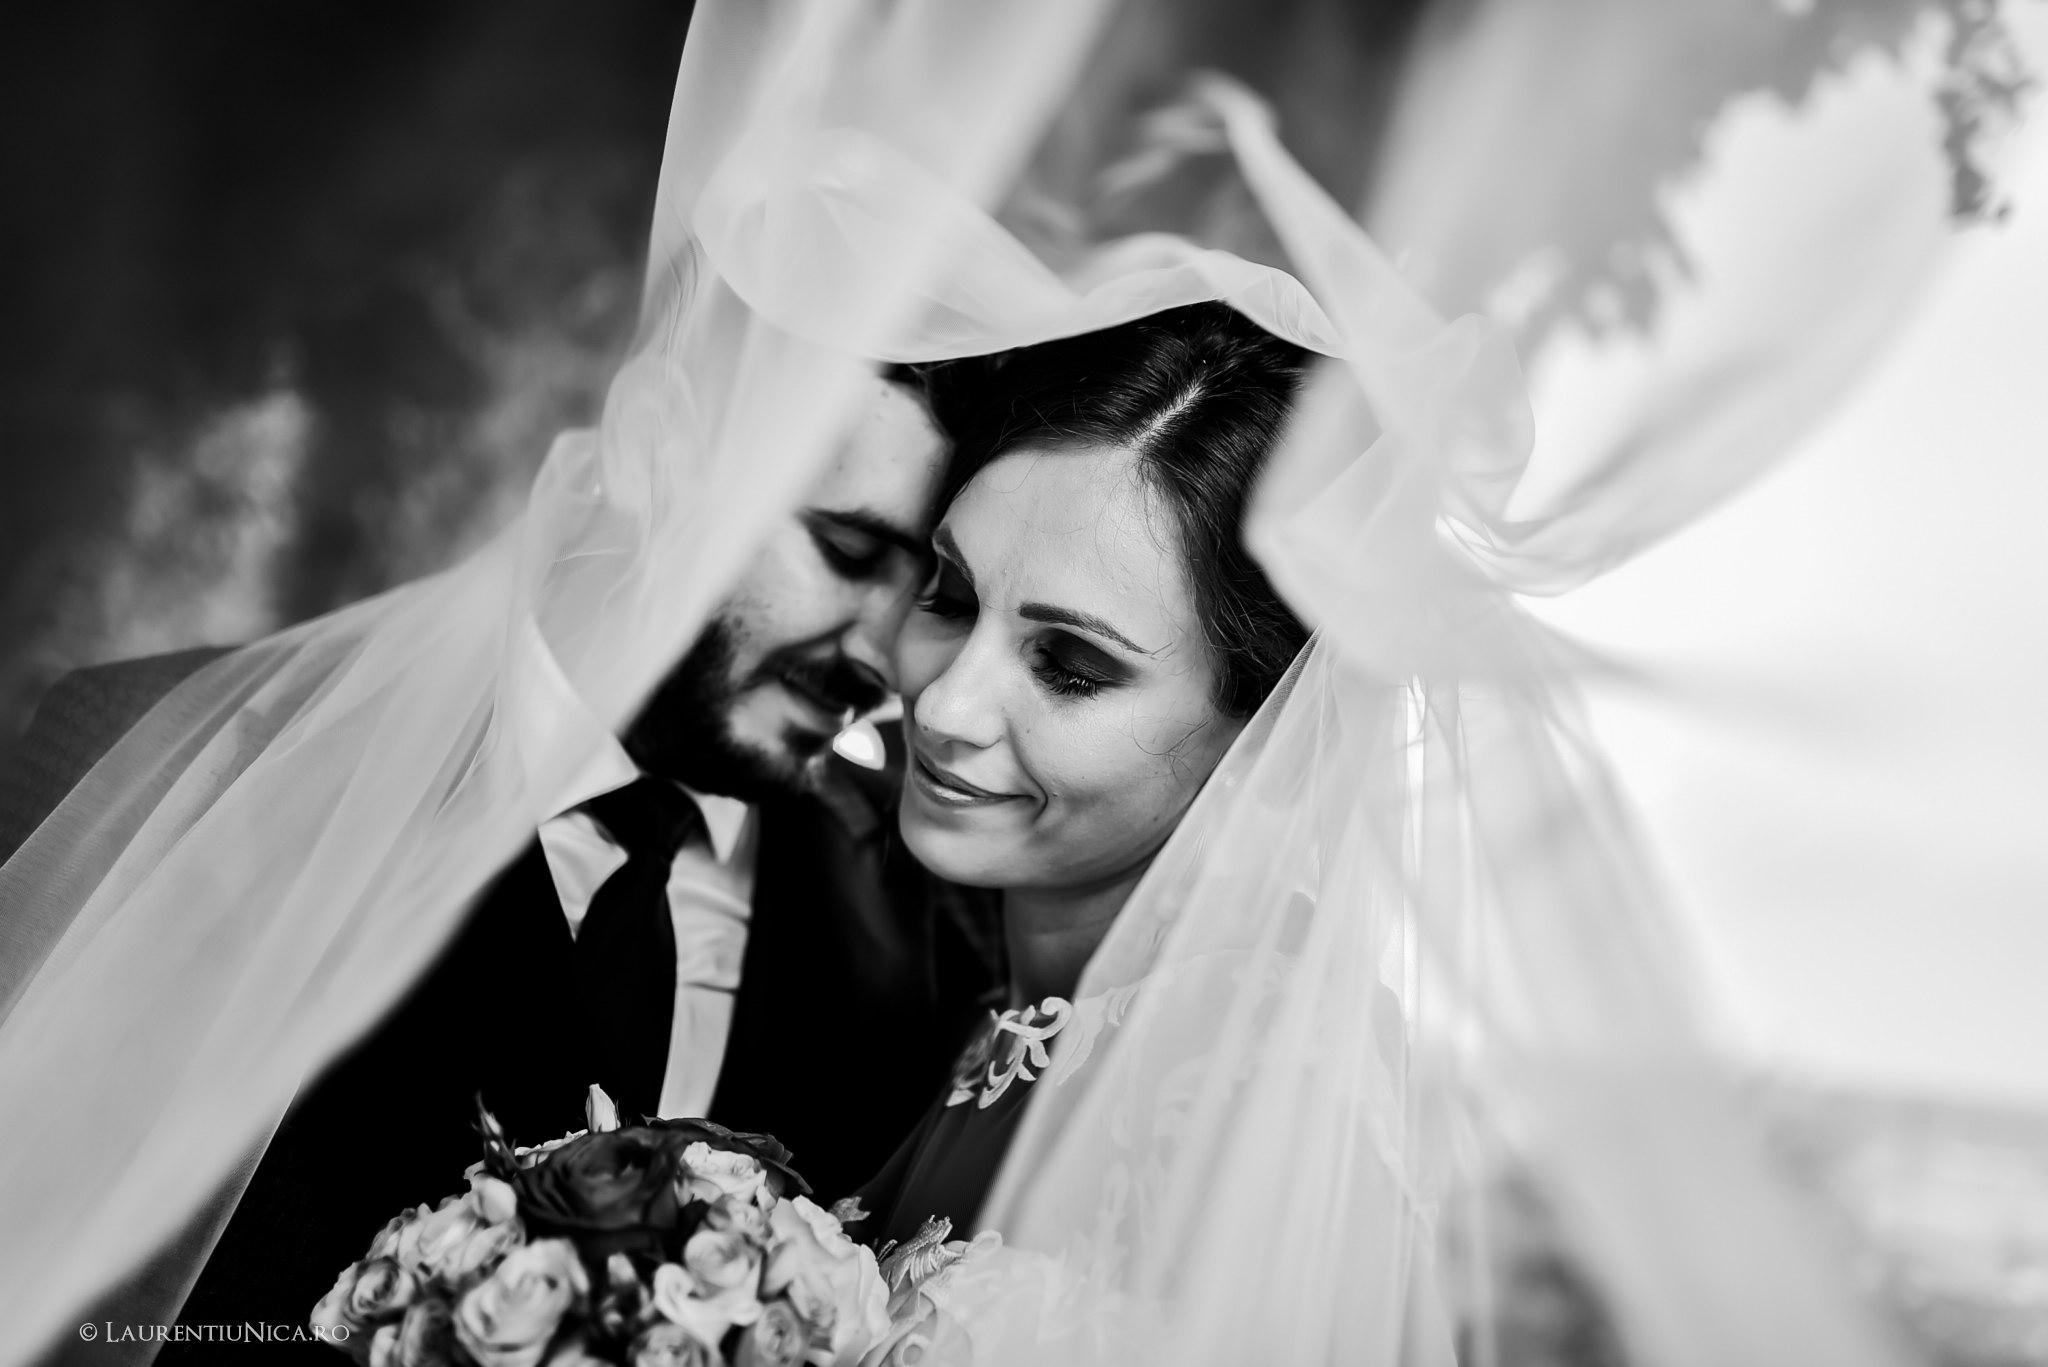 andreea si alin fotografii after wedding balchik bulgaria26 - Andreea & Alin | Fotografii After Wedding | Balchik Bulgaria